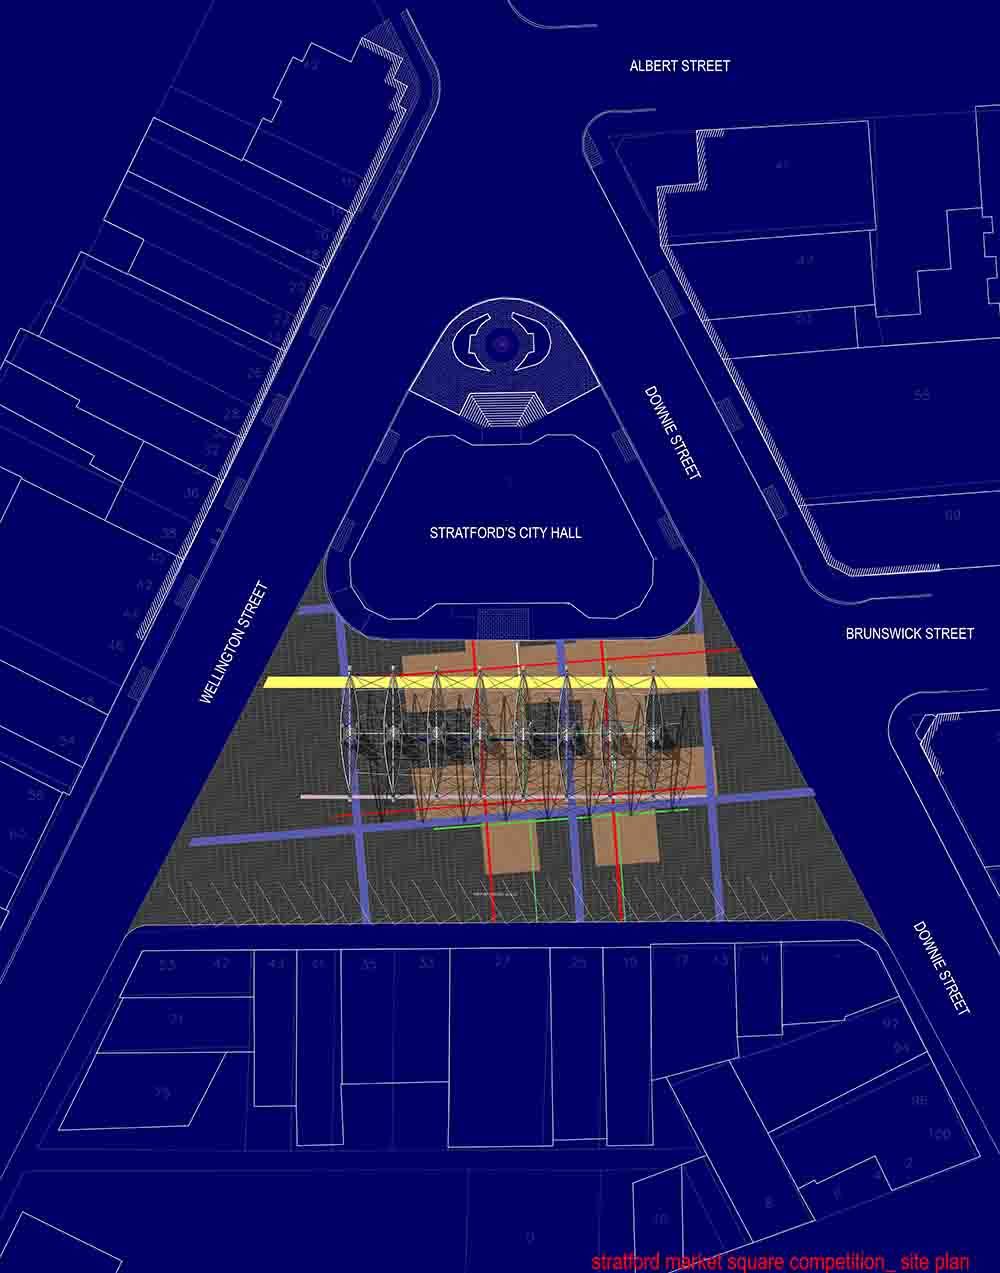 siteplan01(750dpi).jpg